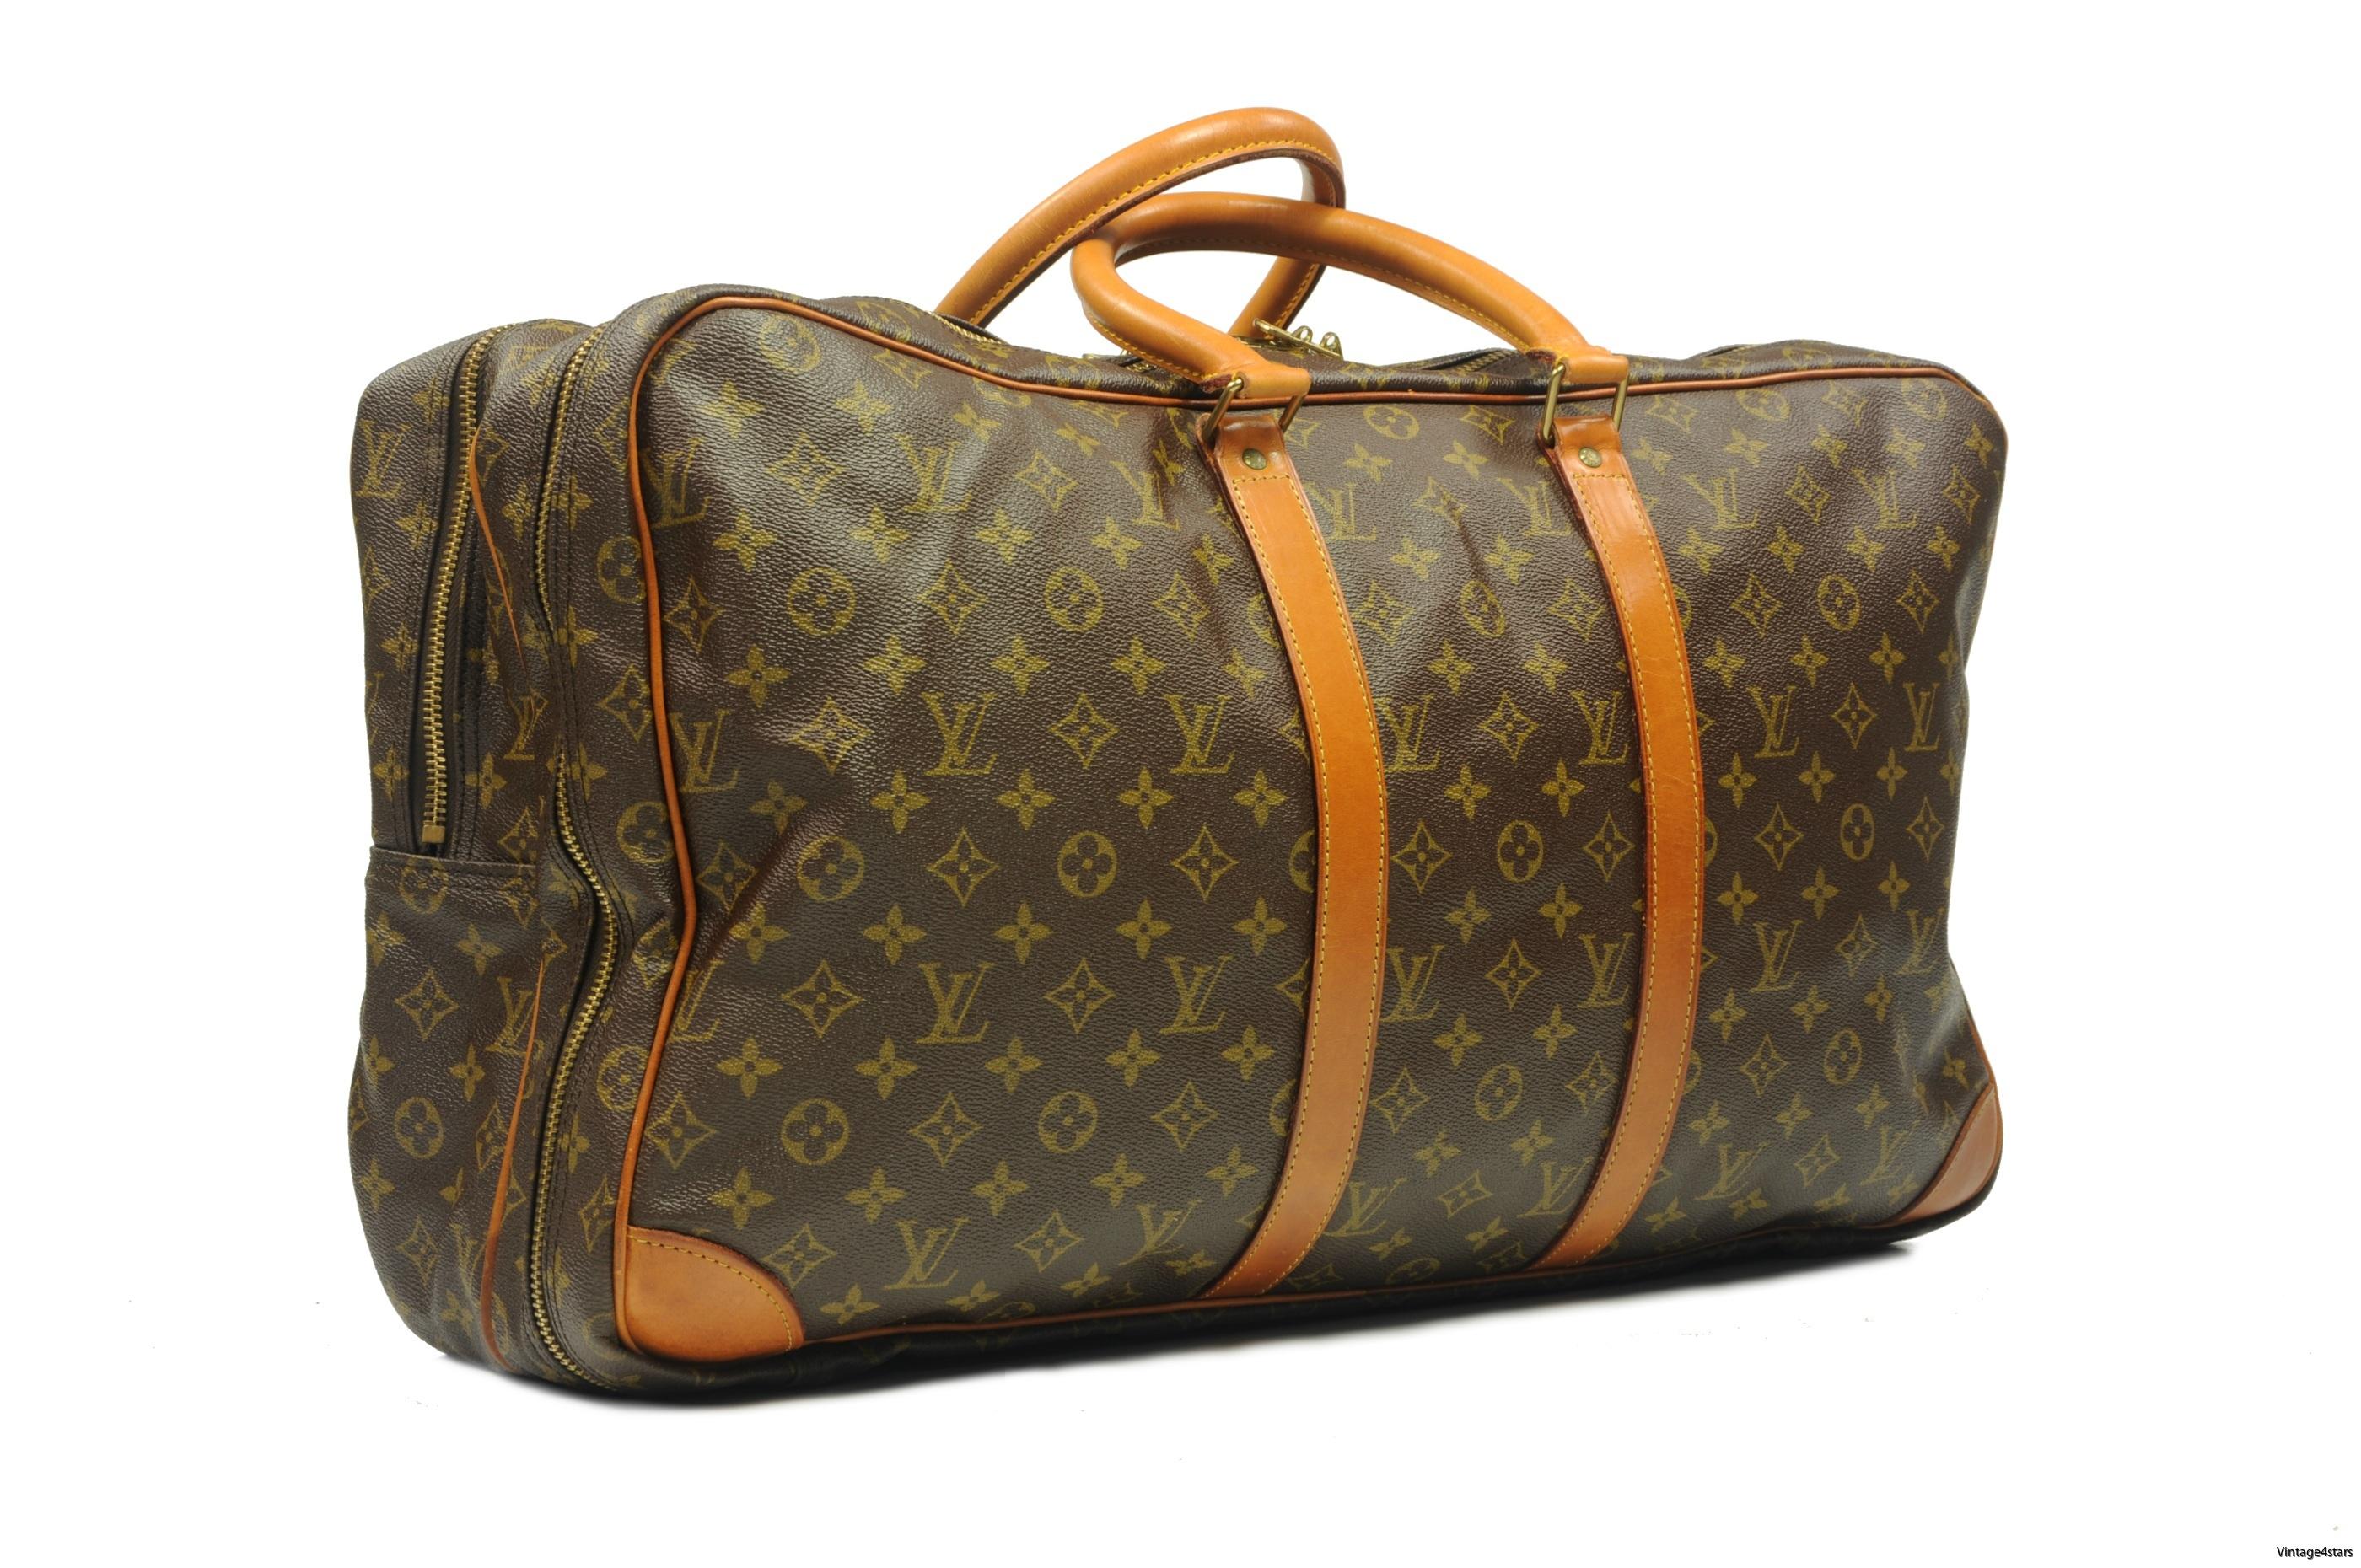 Louis Vuitton Sac 48 Heures 03